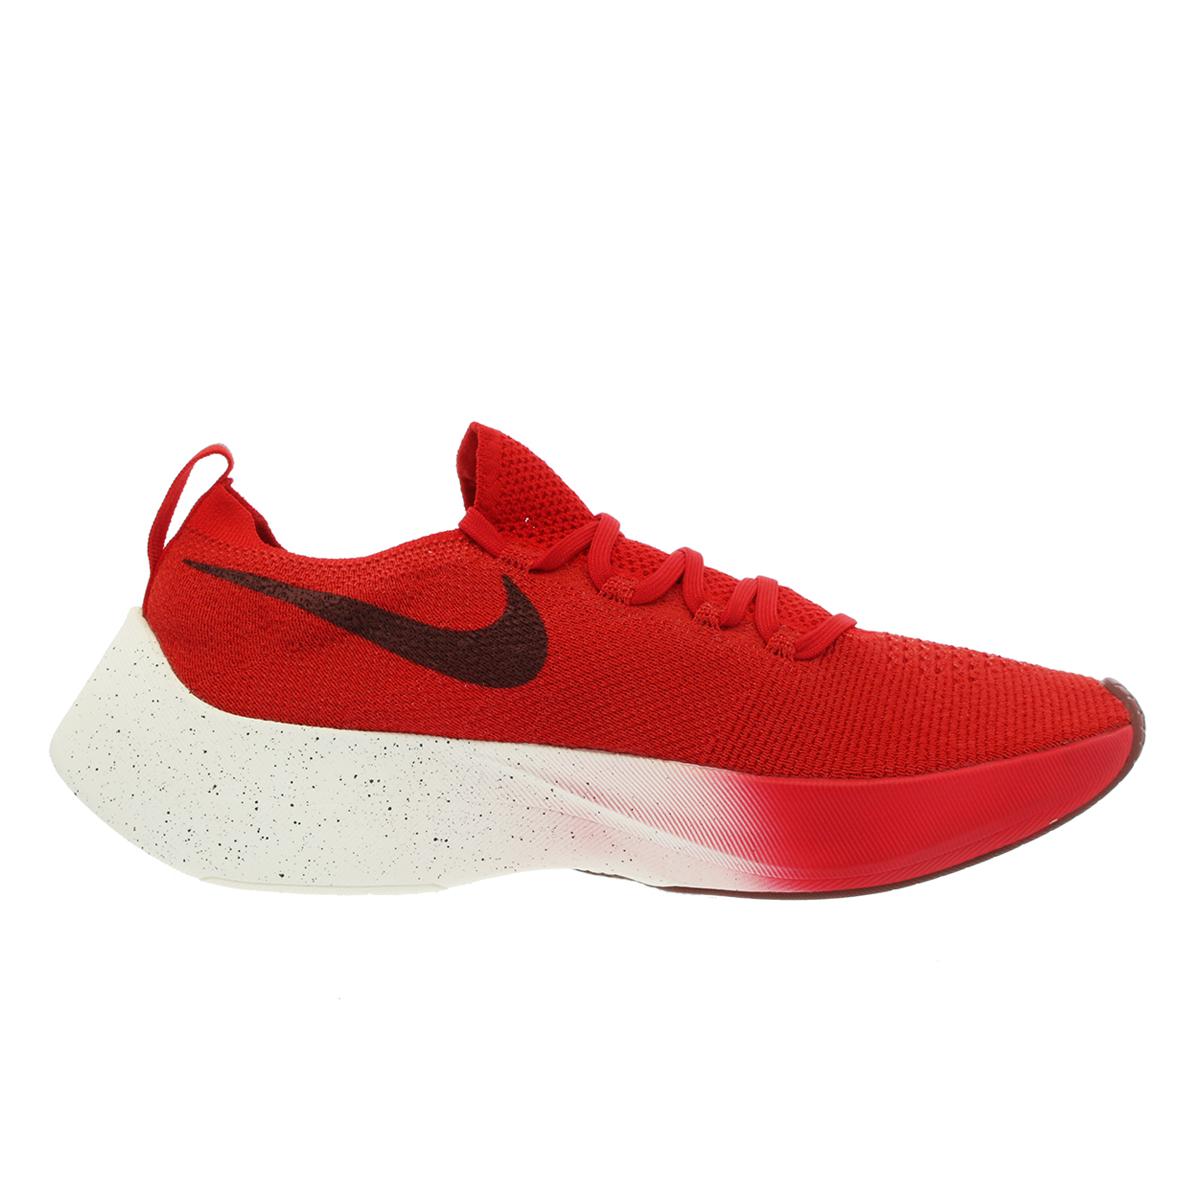 8b7489f969dd NIKE VAPOR STREET FLYKNIT Nike vapor street fried food knit UNIVERSITY RED DARK  TEAM RED SAIL BLACK